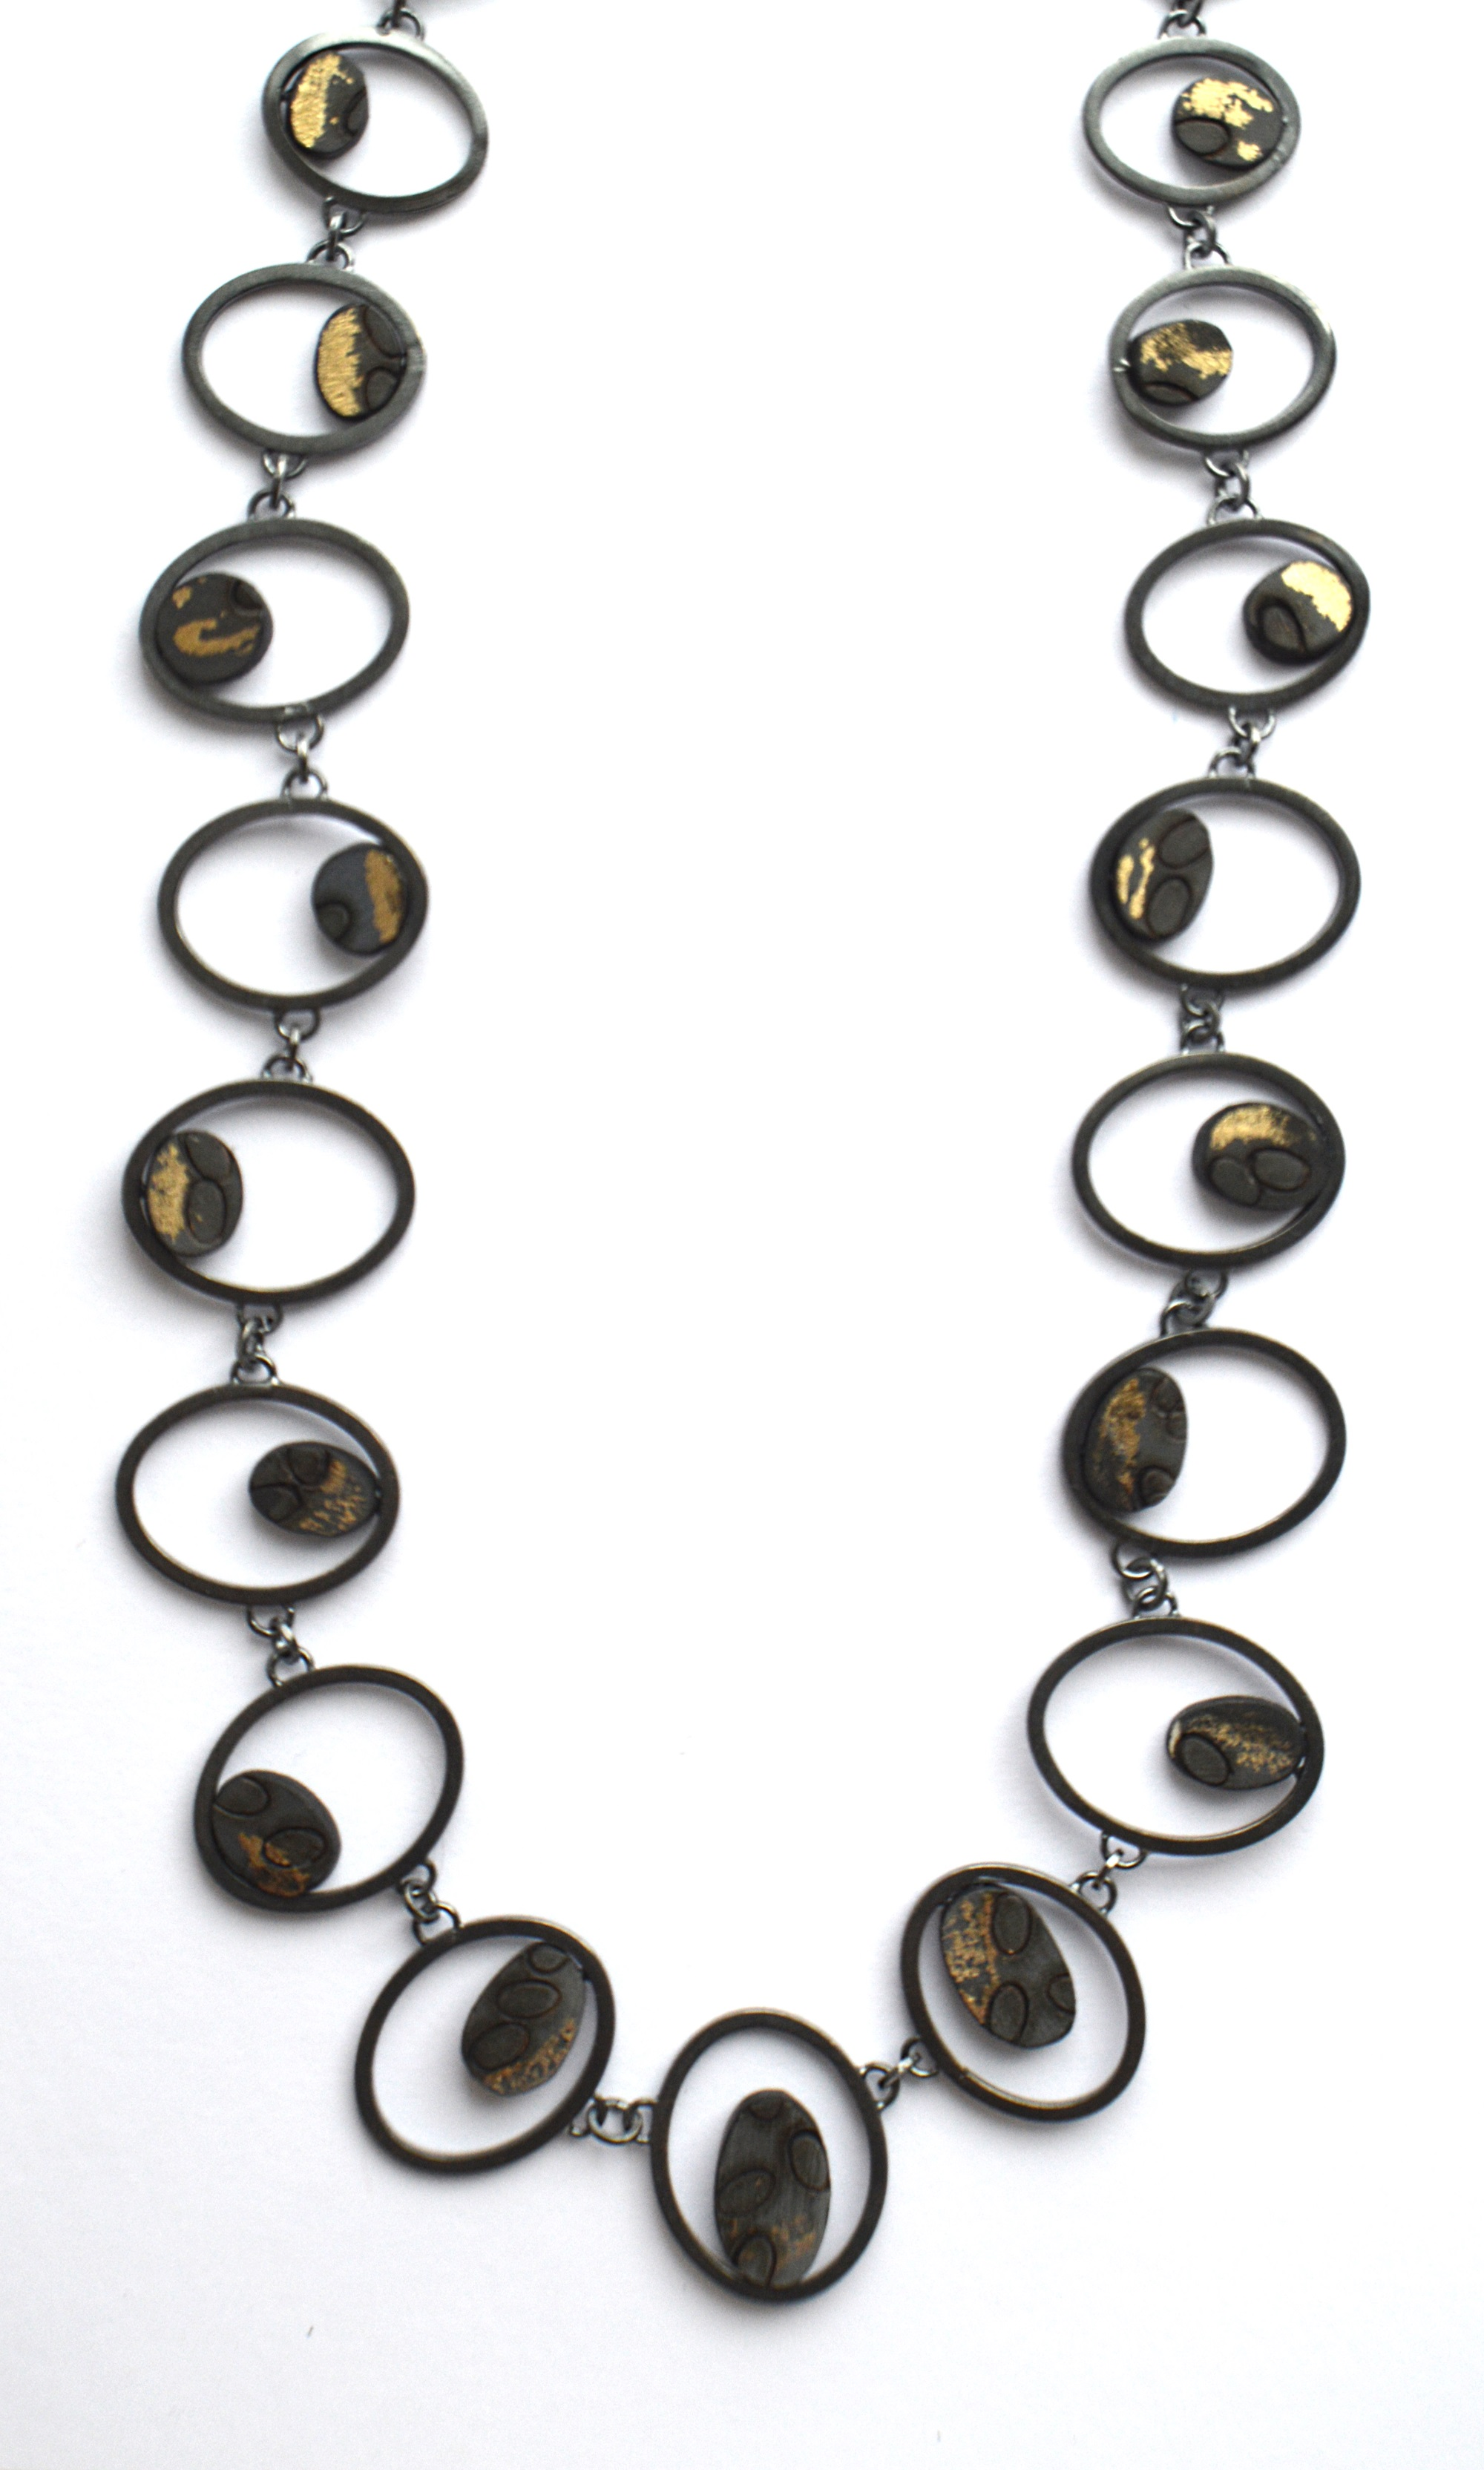 Oxidised link necklace